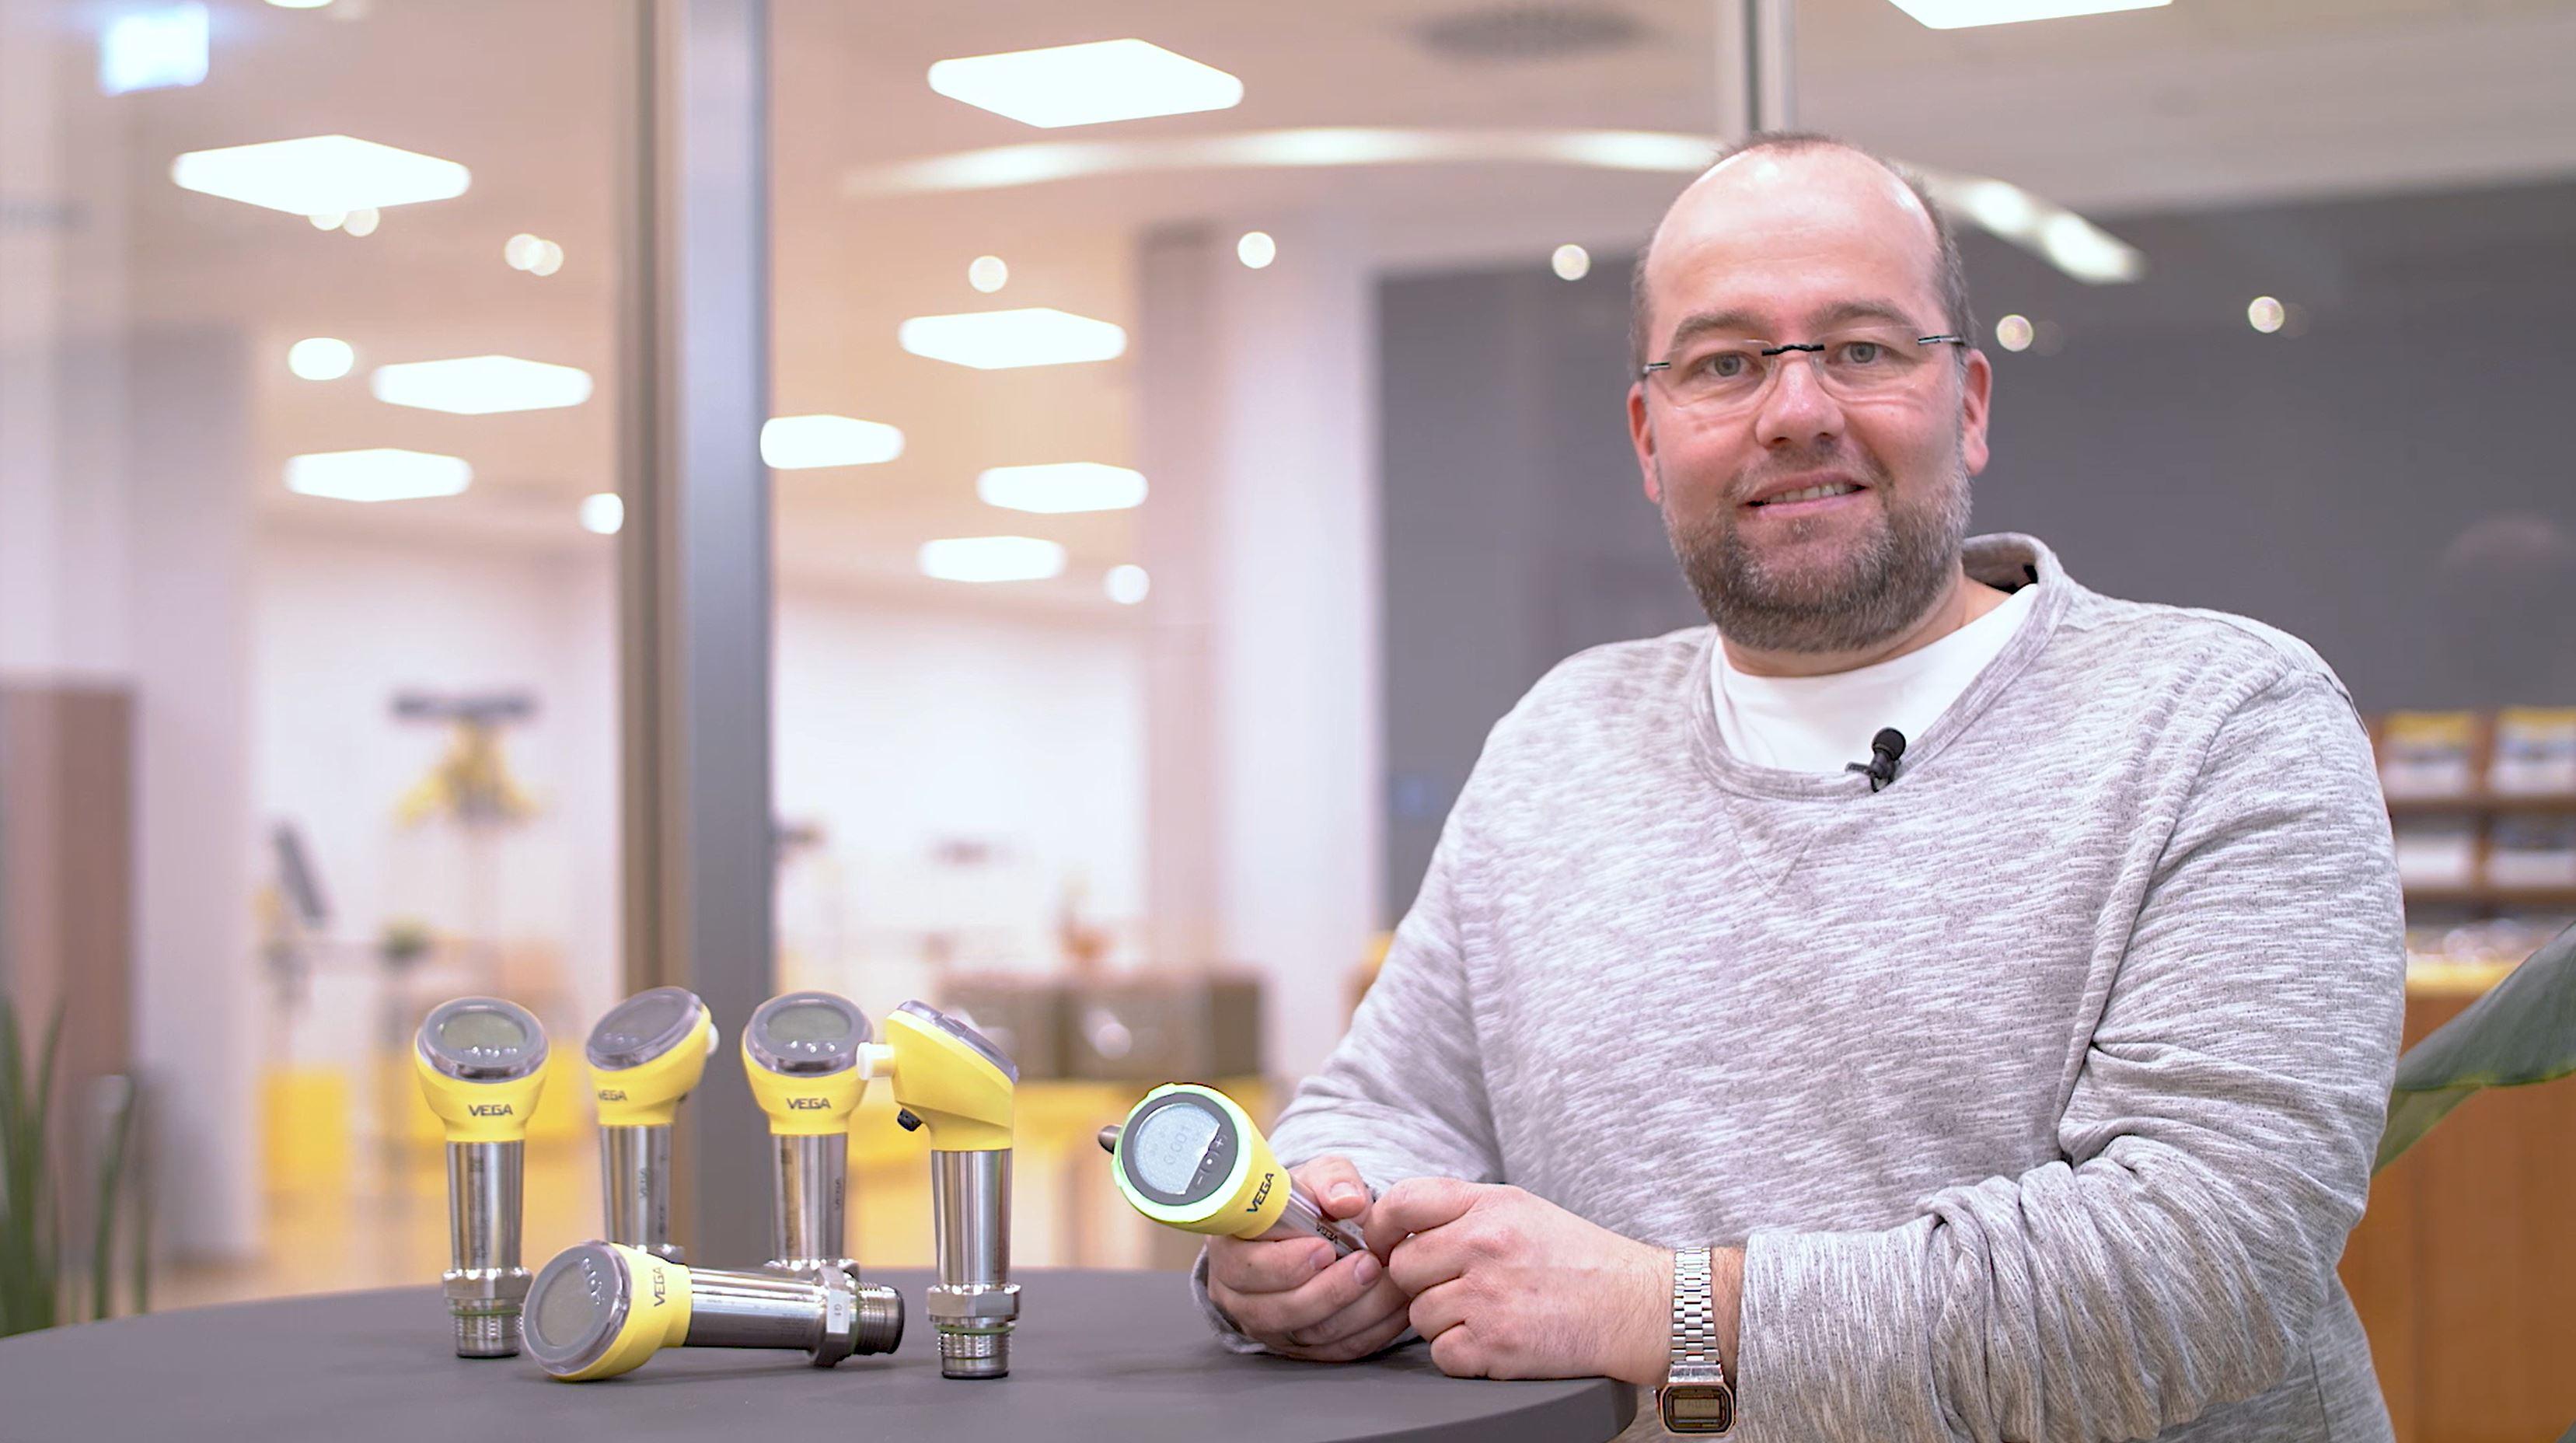 VEGAtalk 带256种彩色灯环的压力和限位仪表使生产状态一目了然